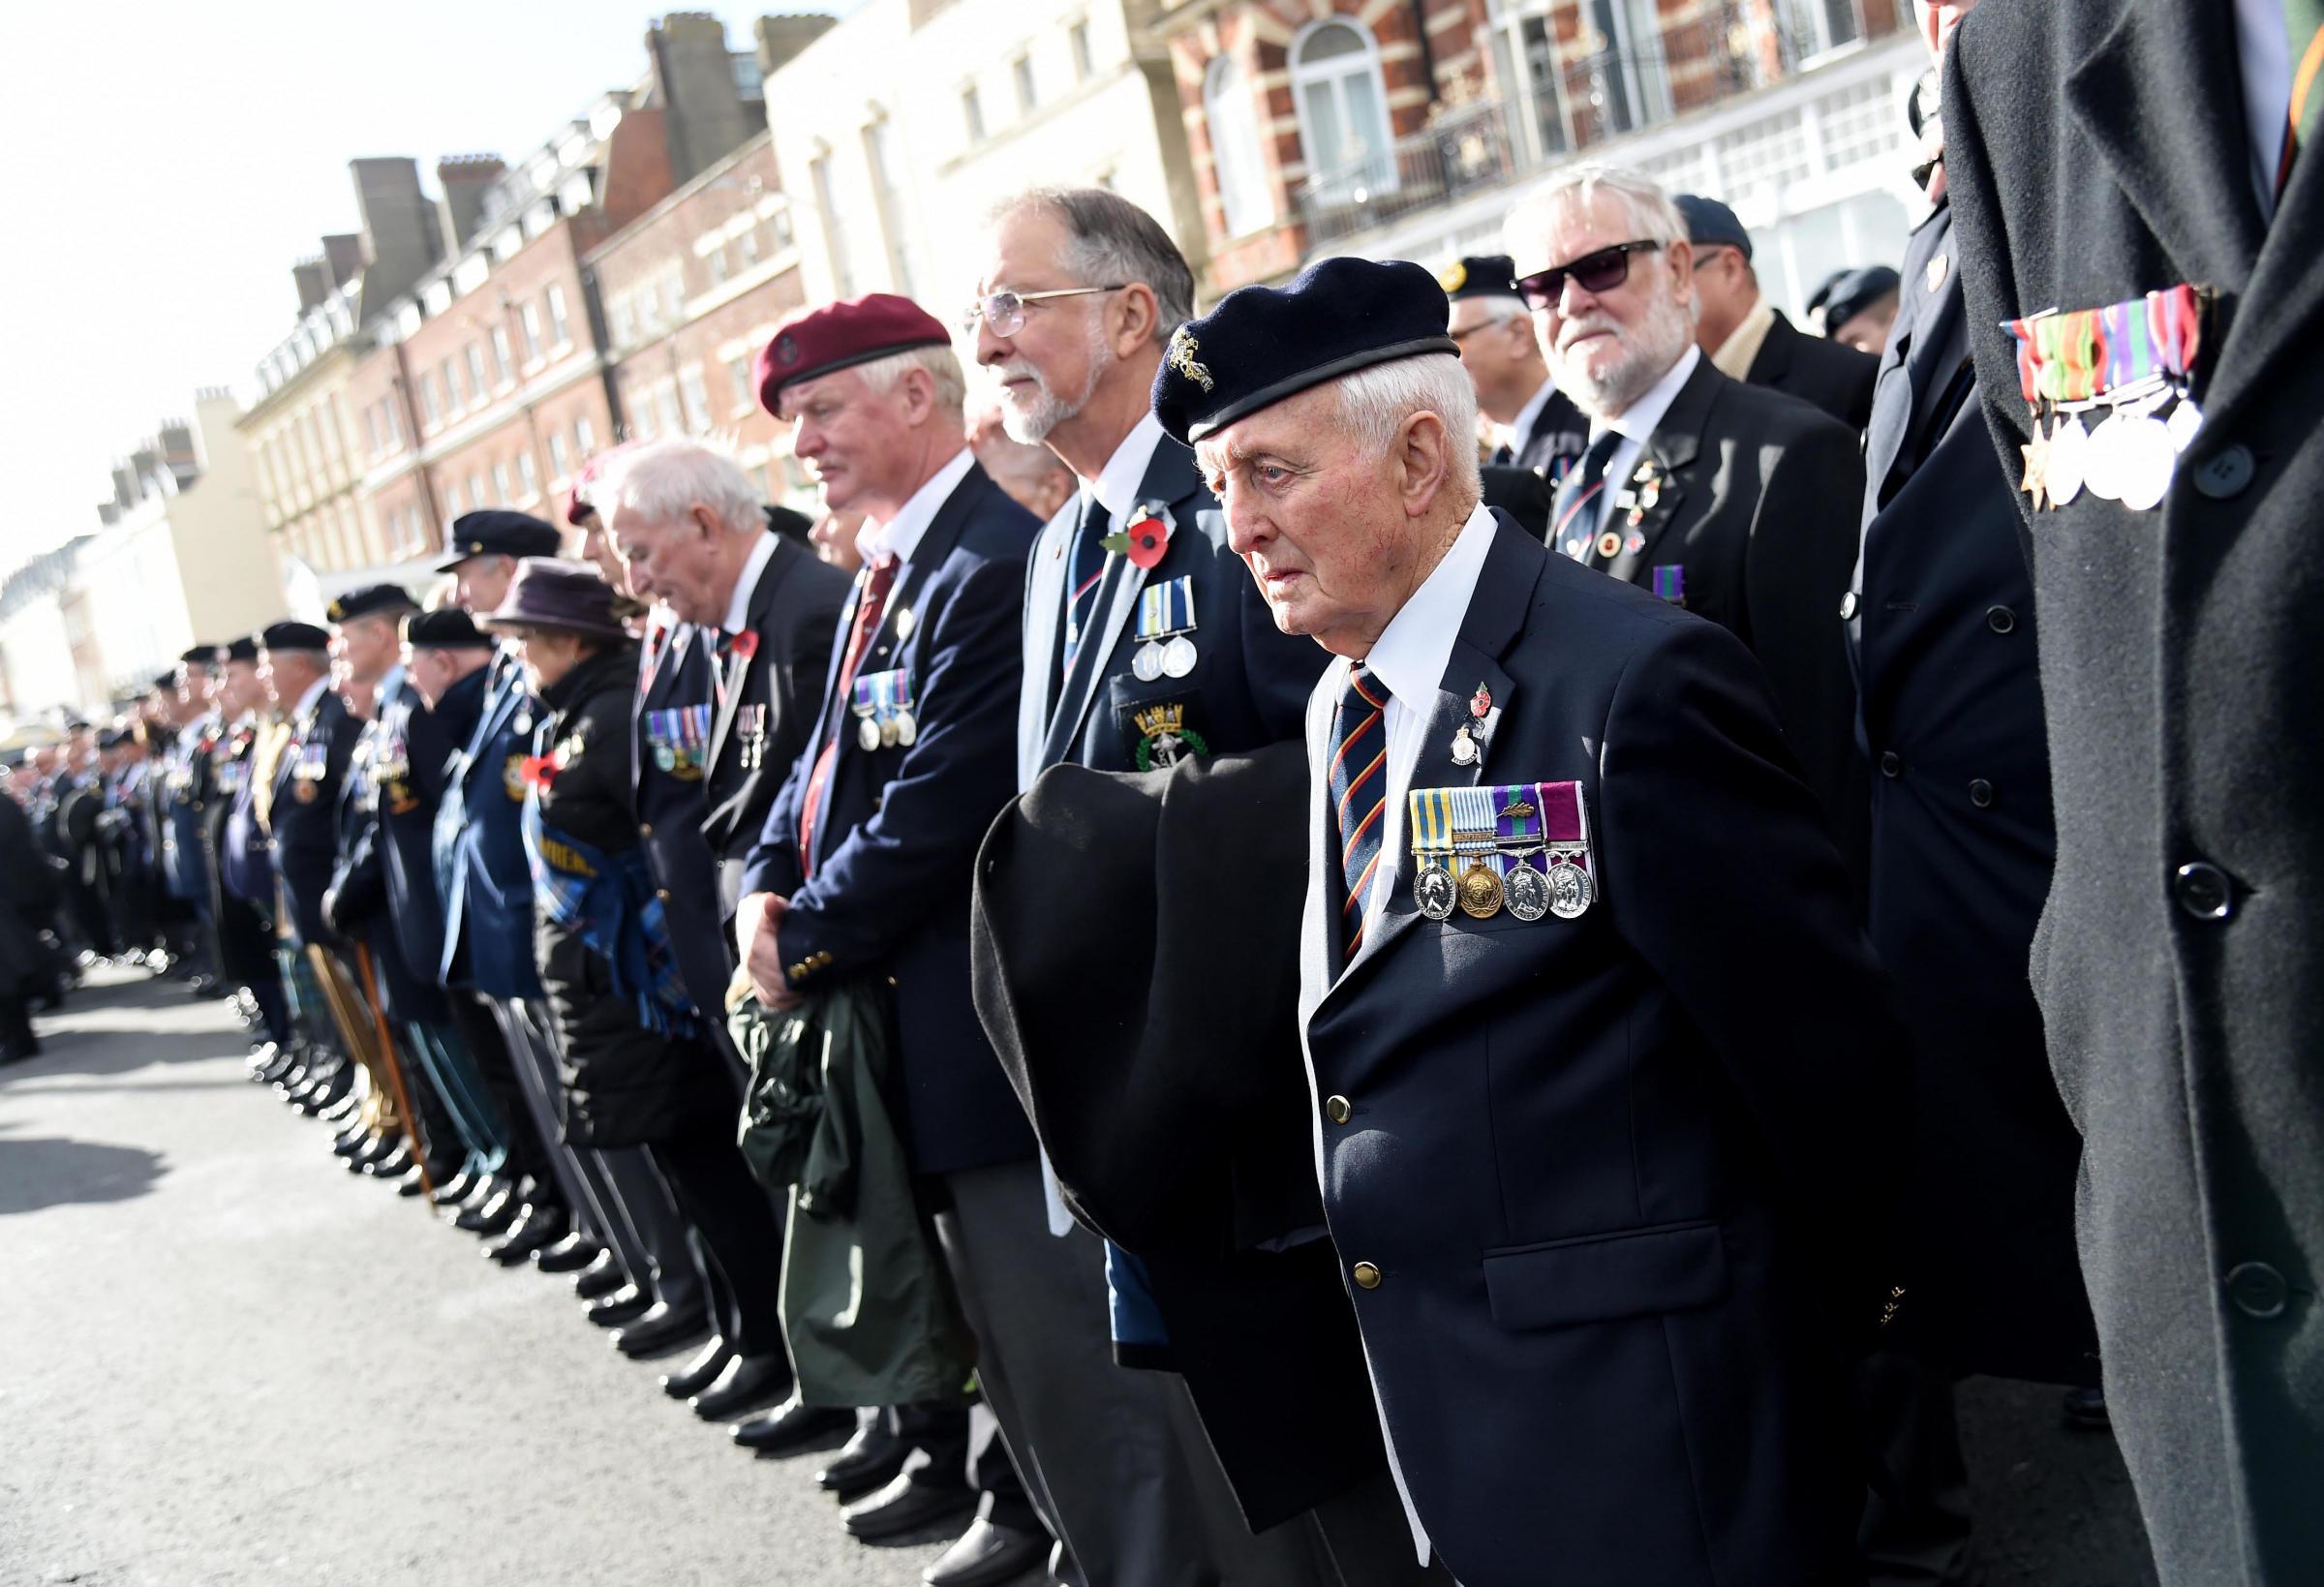 Coronavirus: Royal British Legion supporting veterans during crisis